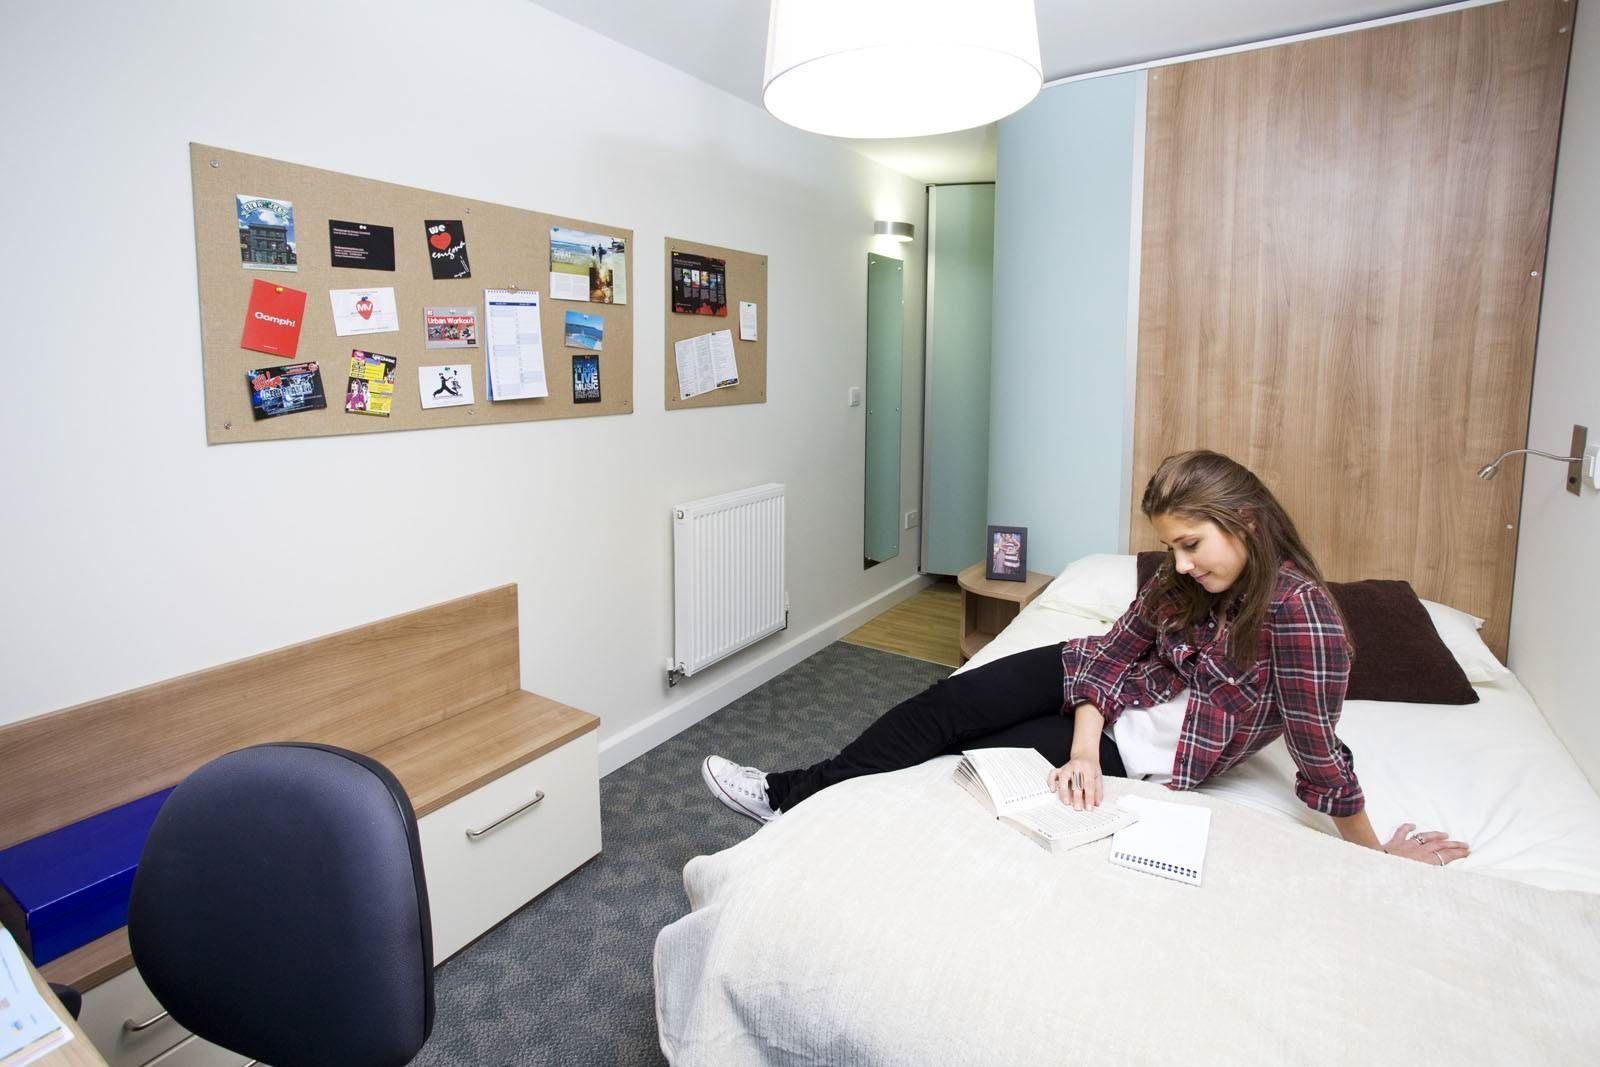 Room Transfers Unite Students